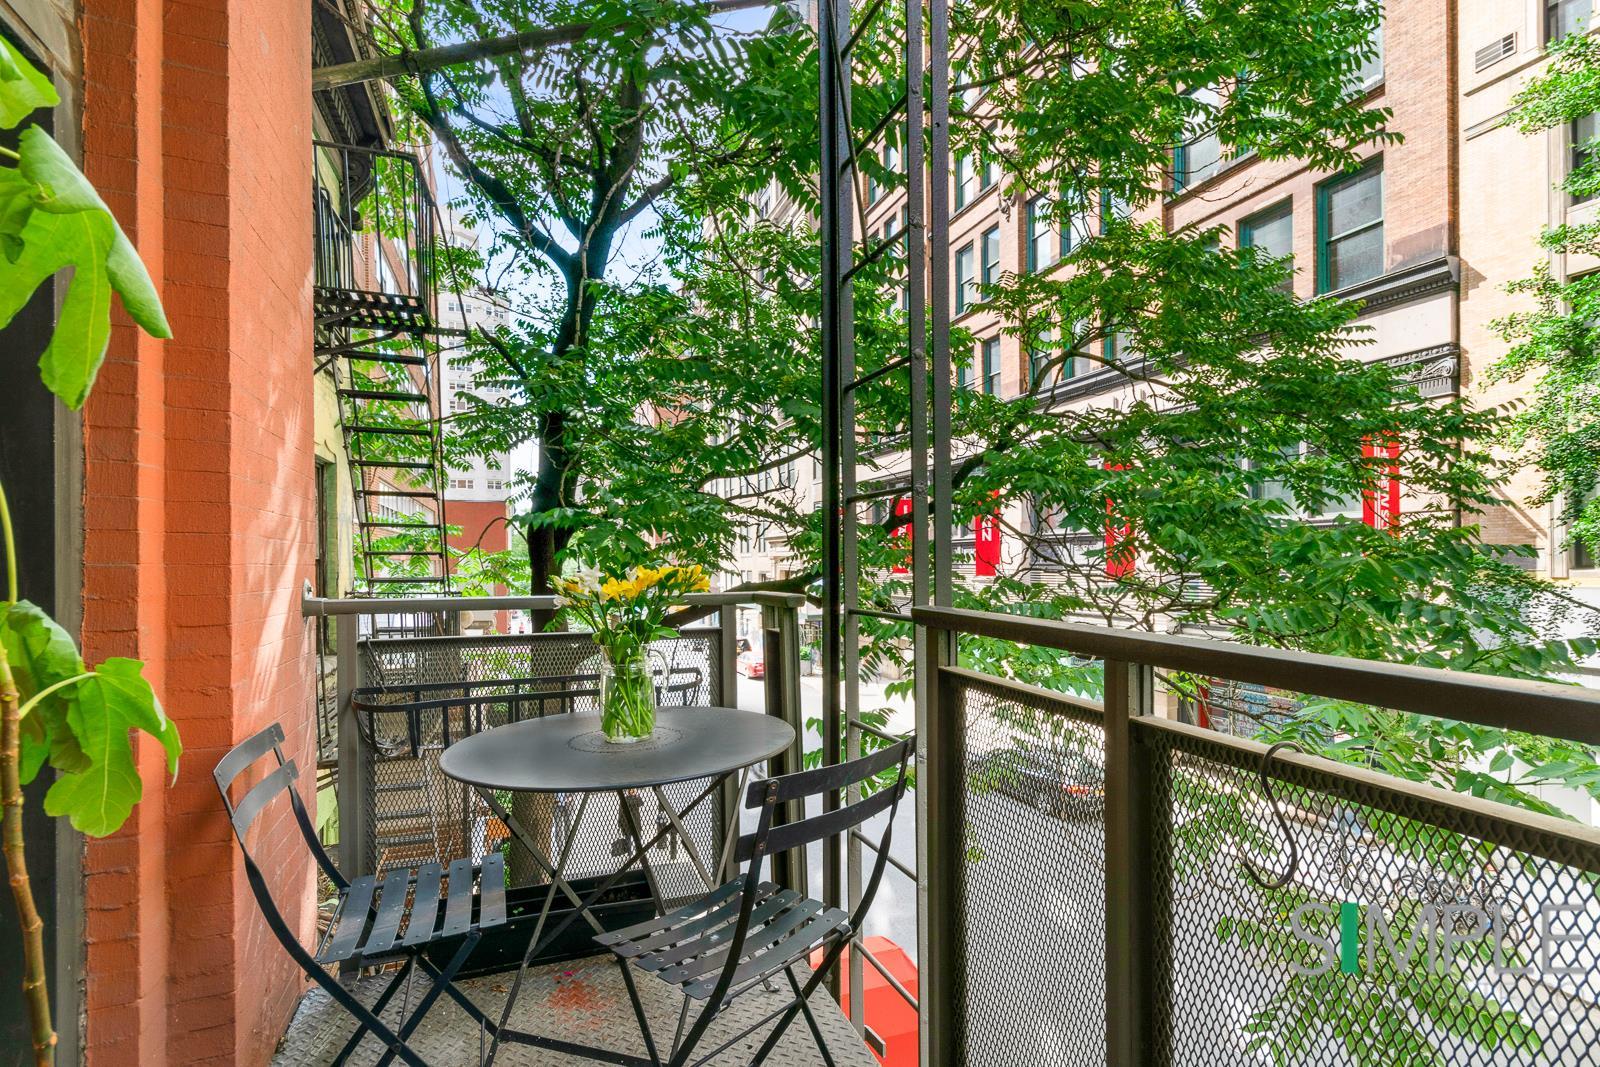 42 West 13th Street Greenwich Village New York NY 10011